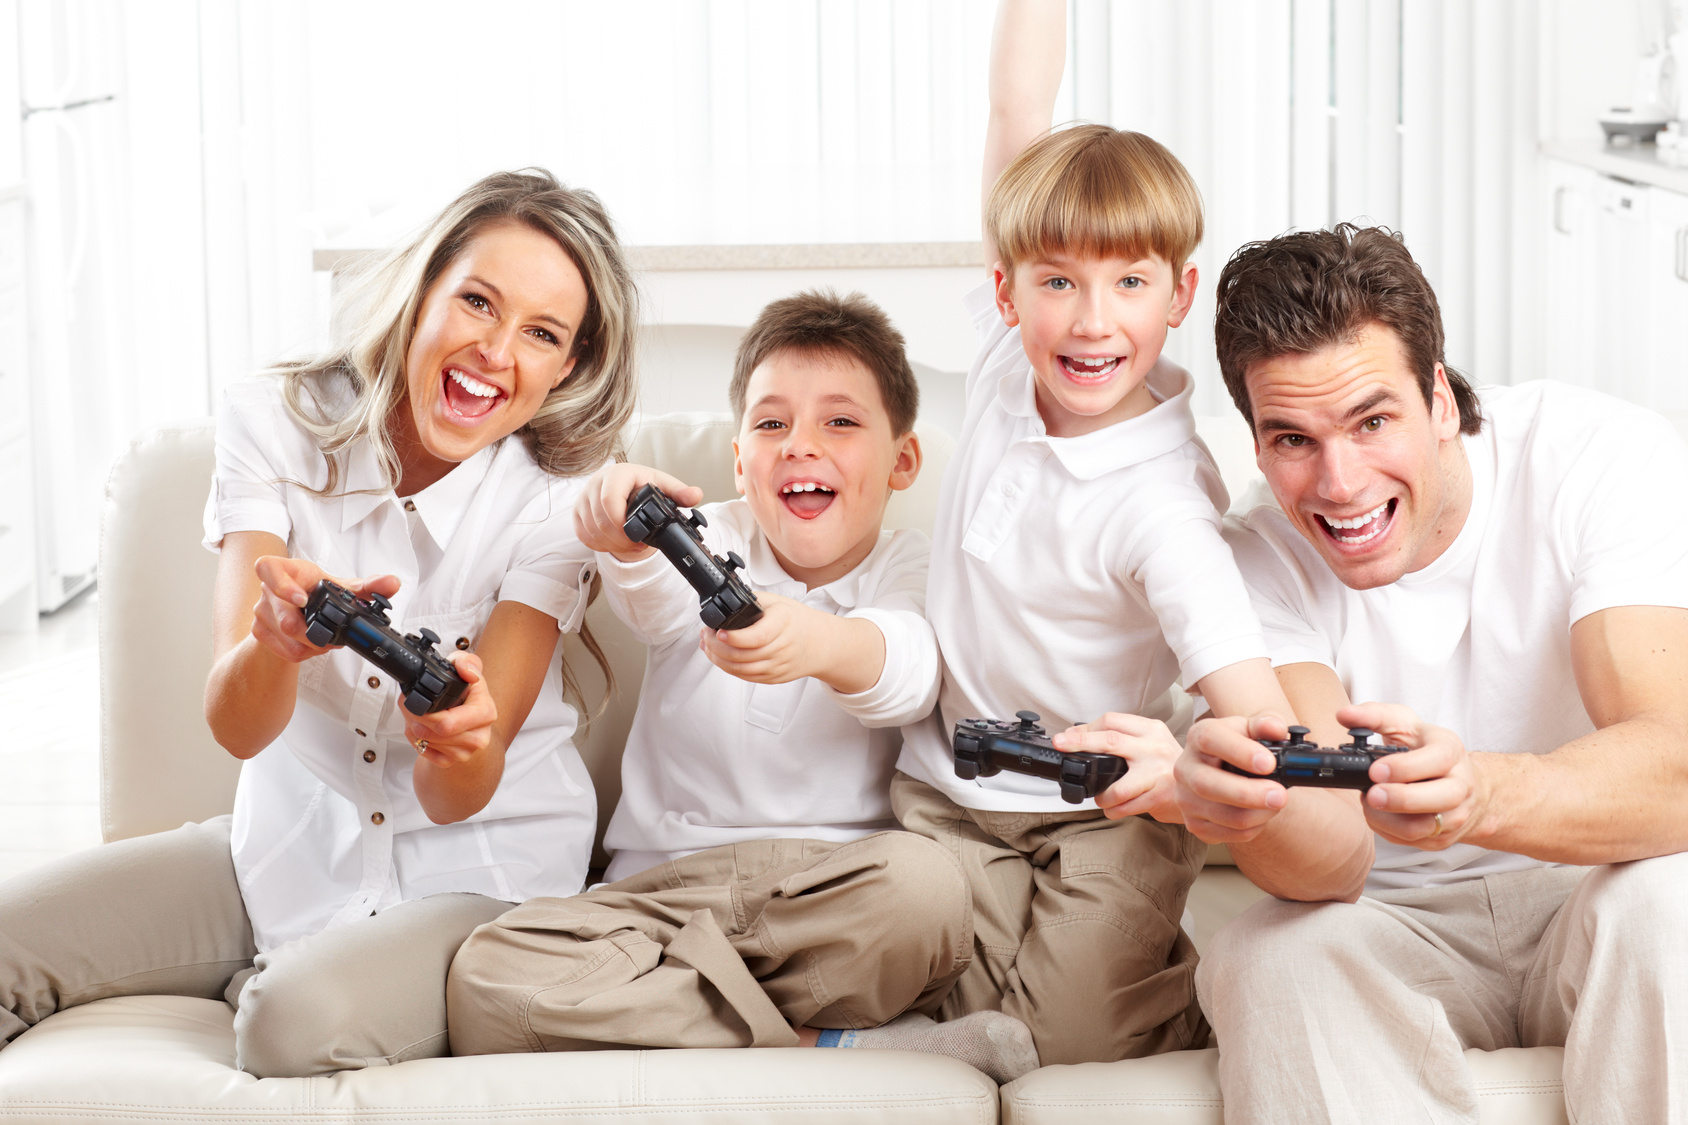 joy family friendly gaming - 1100×732